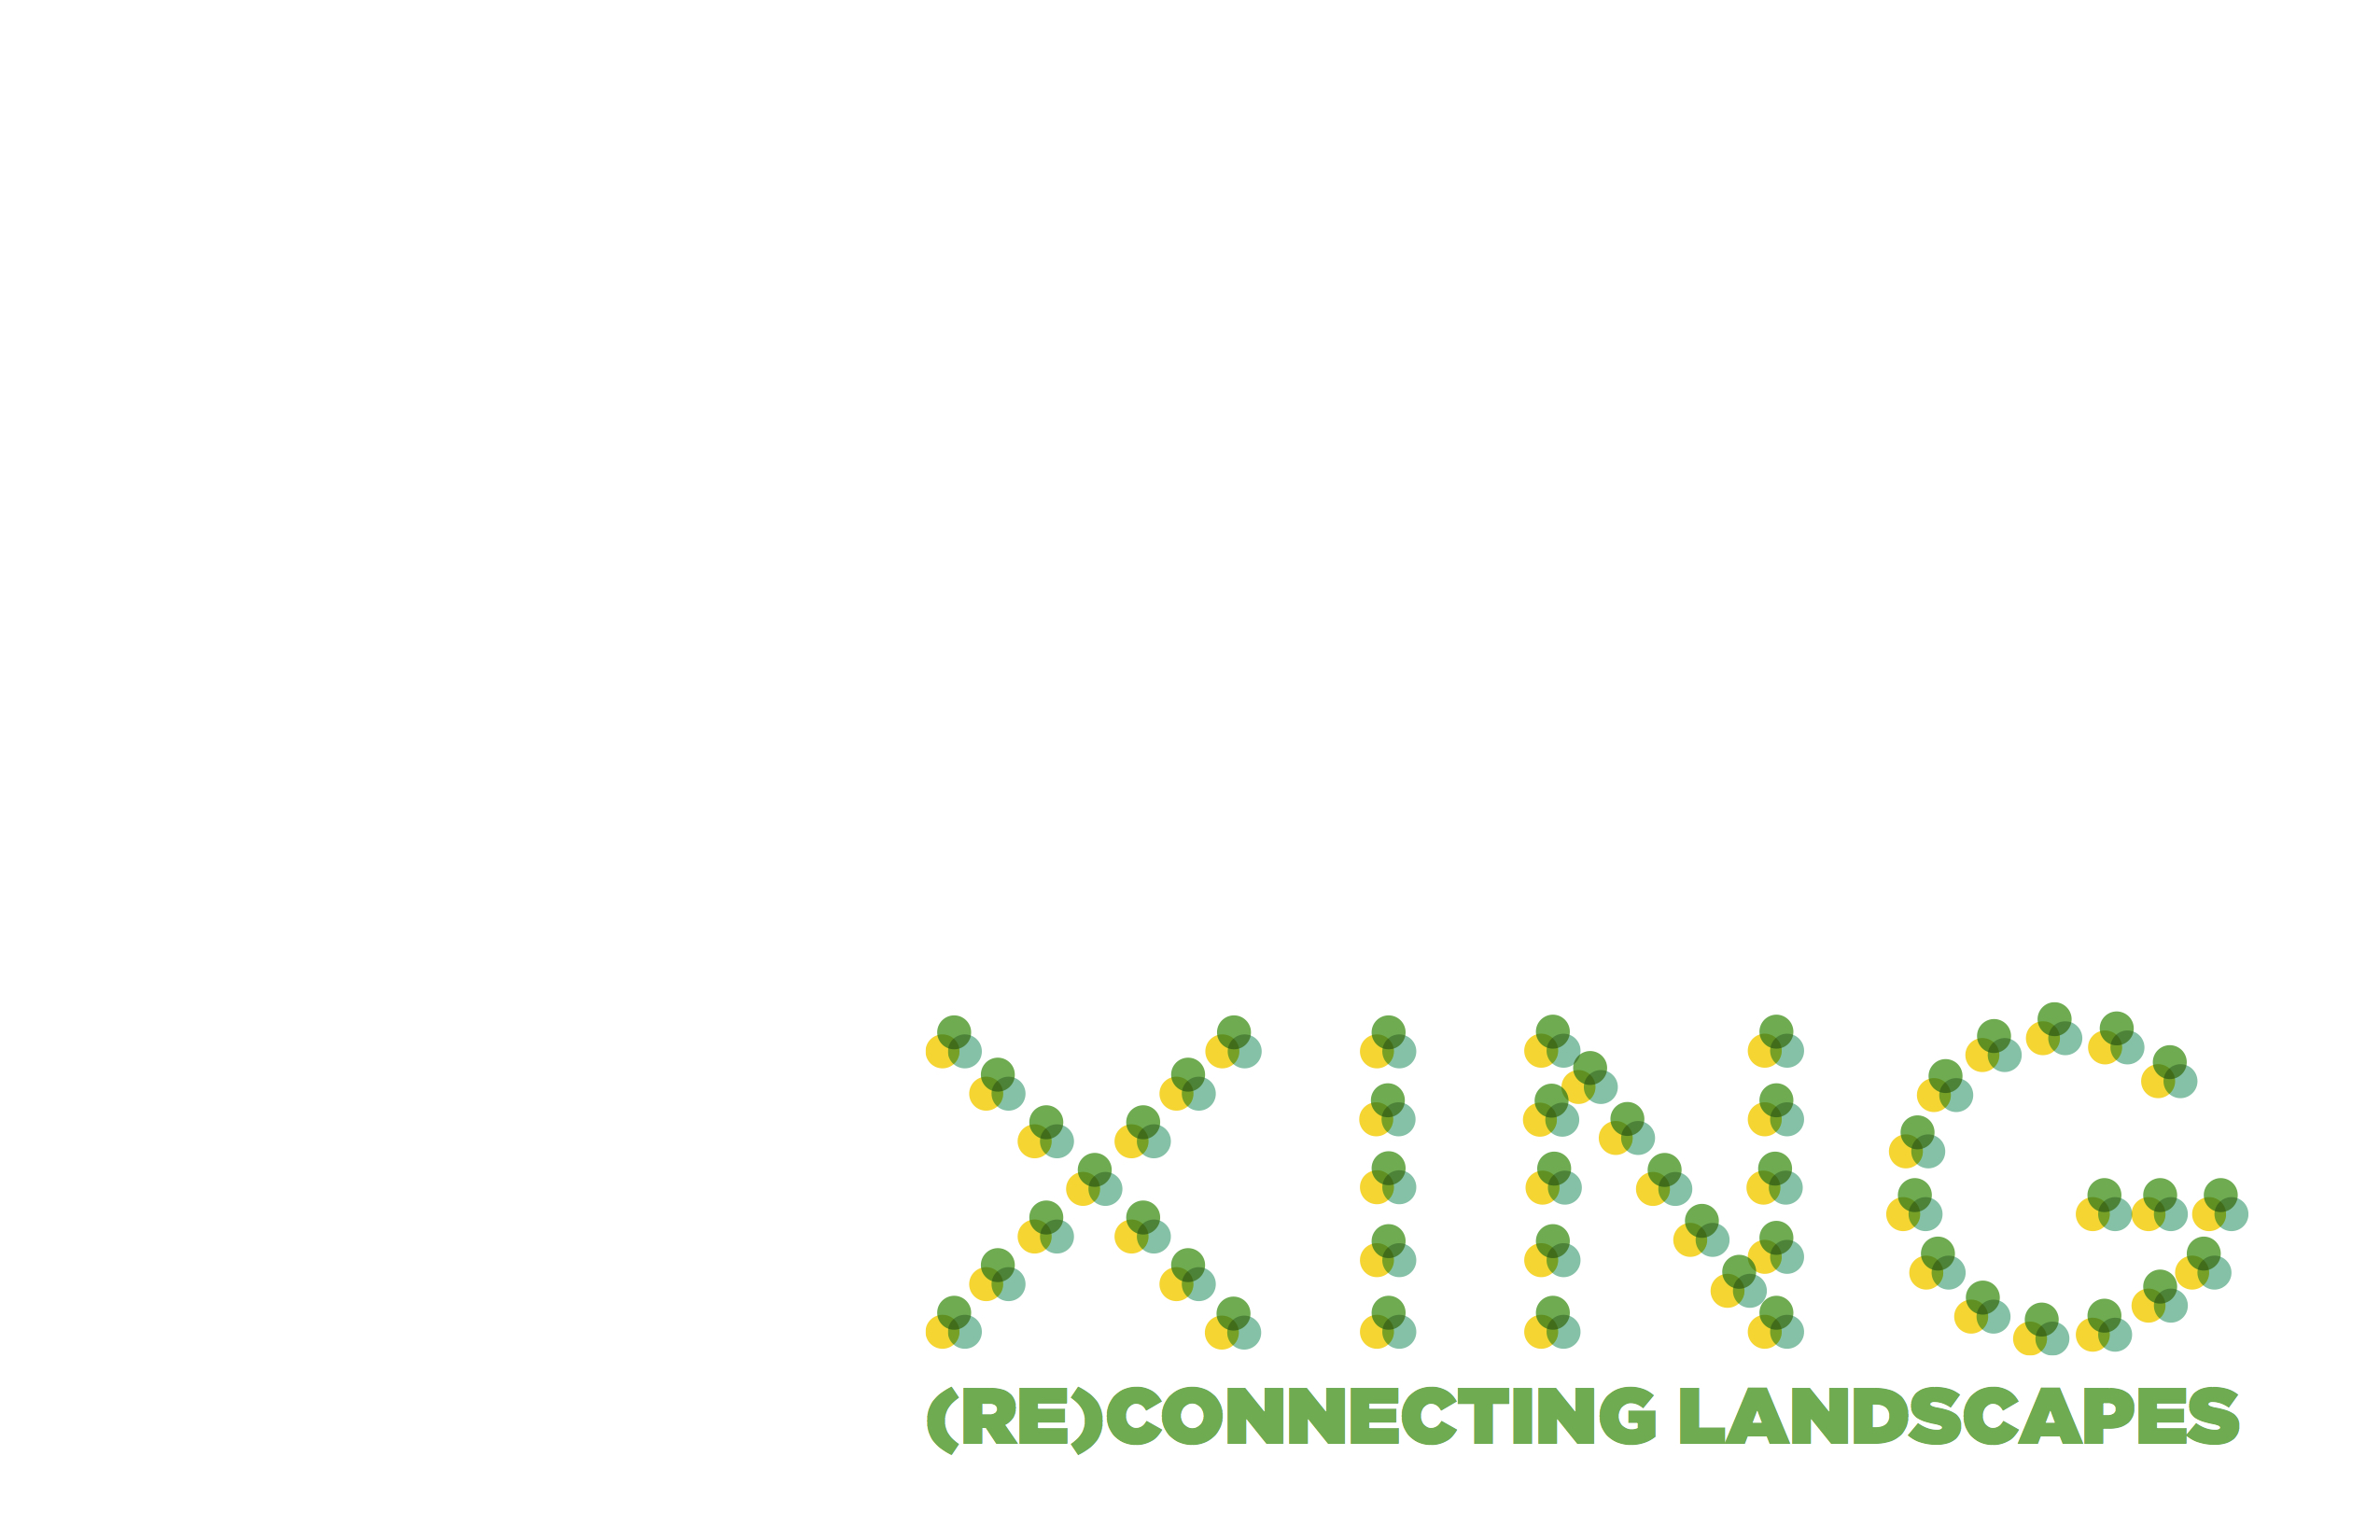 XING Portfolio (Title Page)